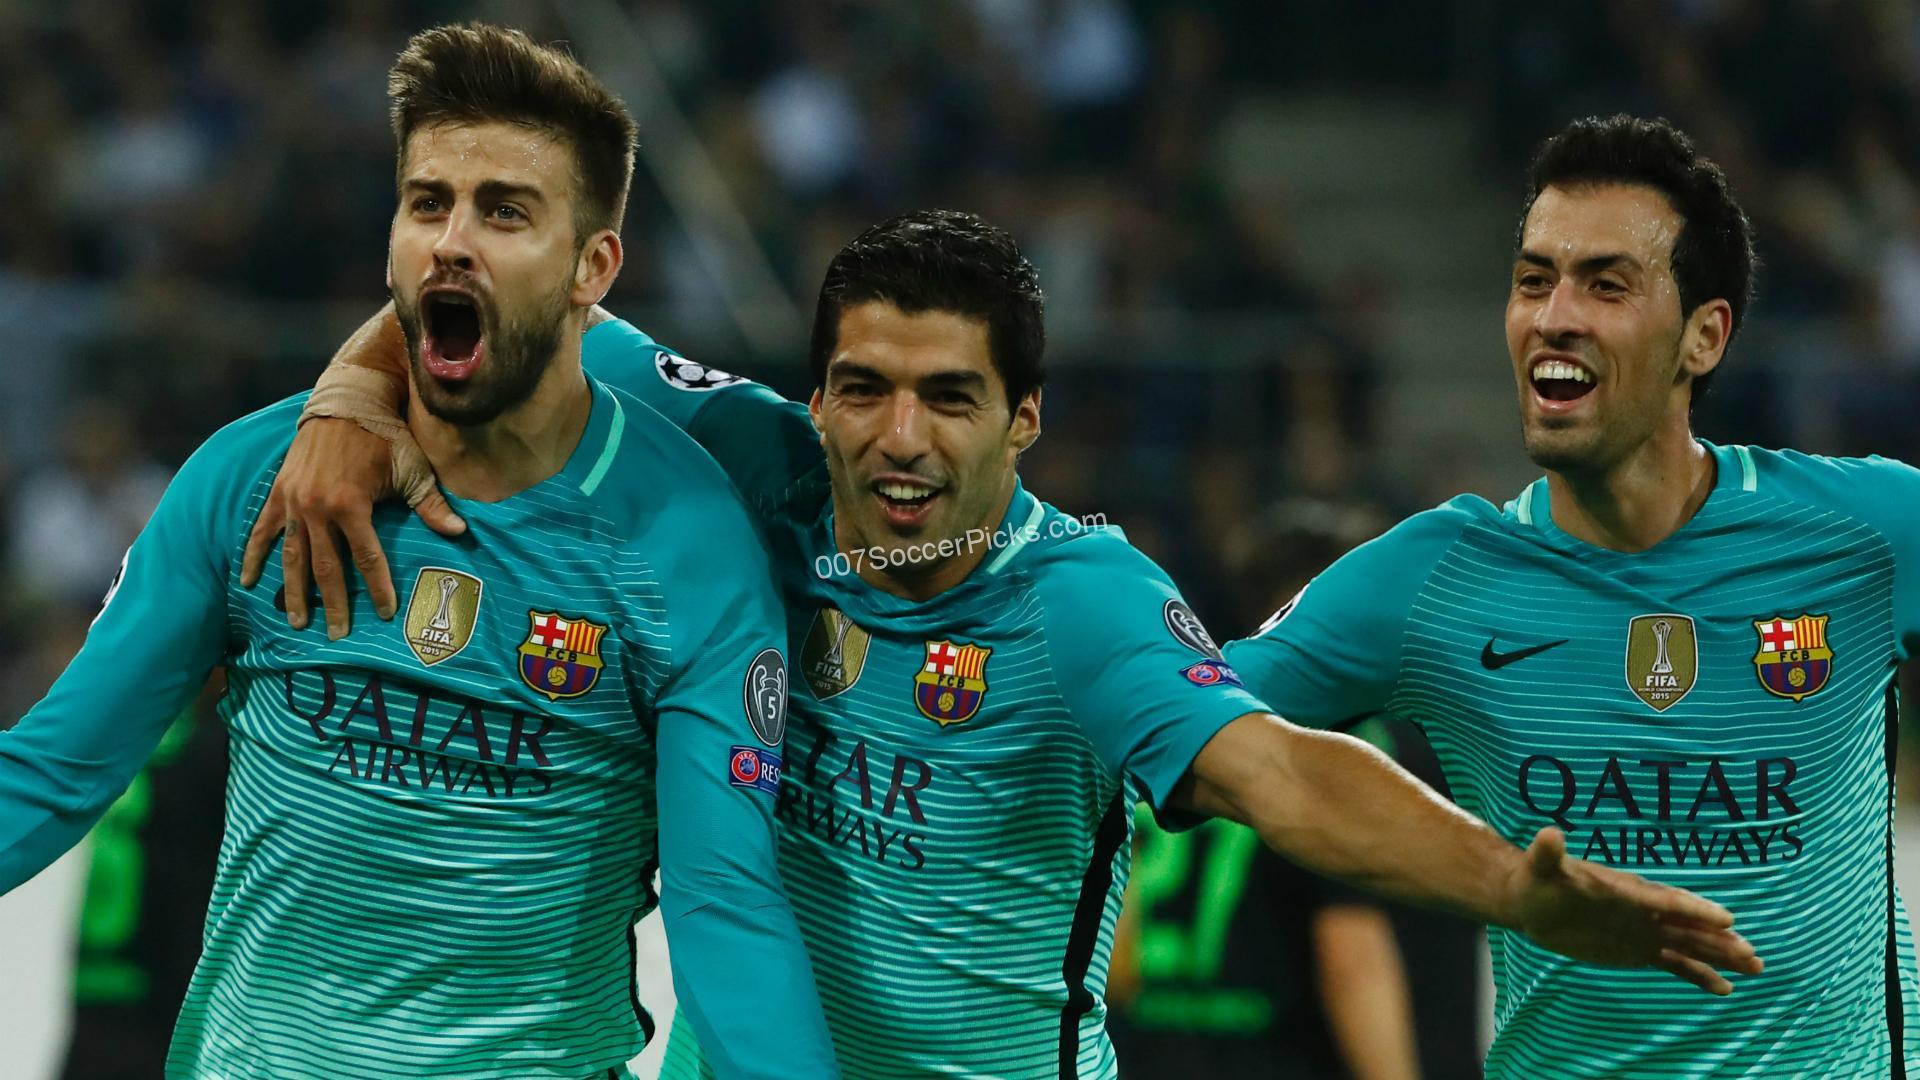 Barcelona-B.-Monchengladbach-prediction